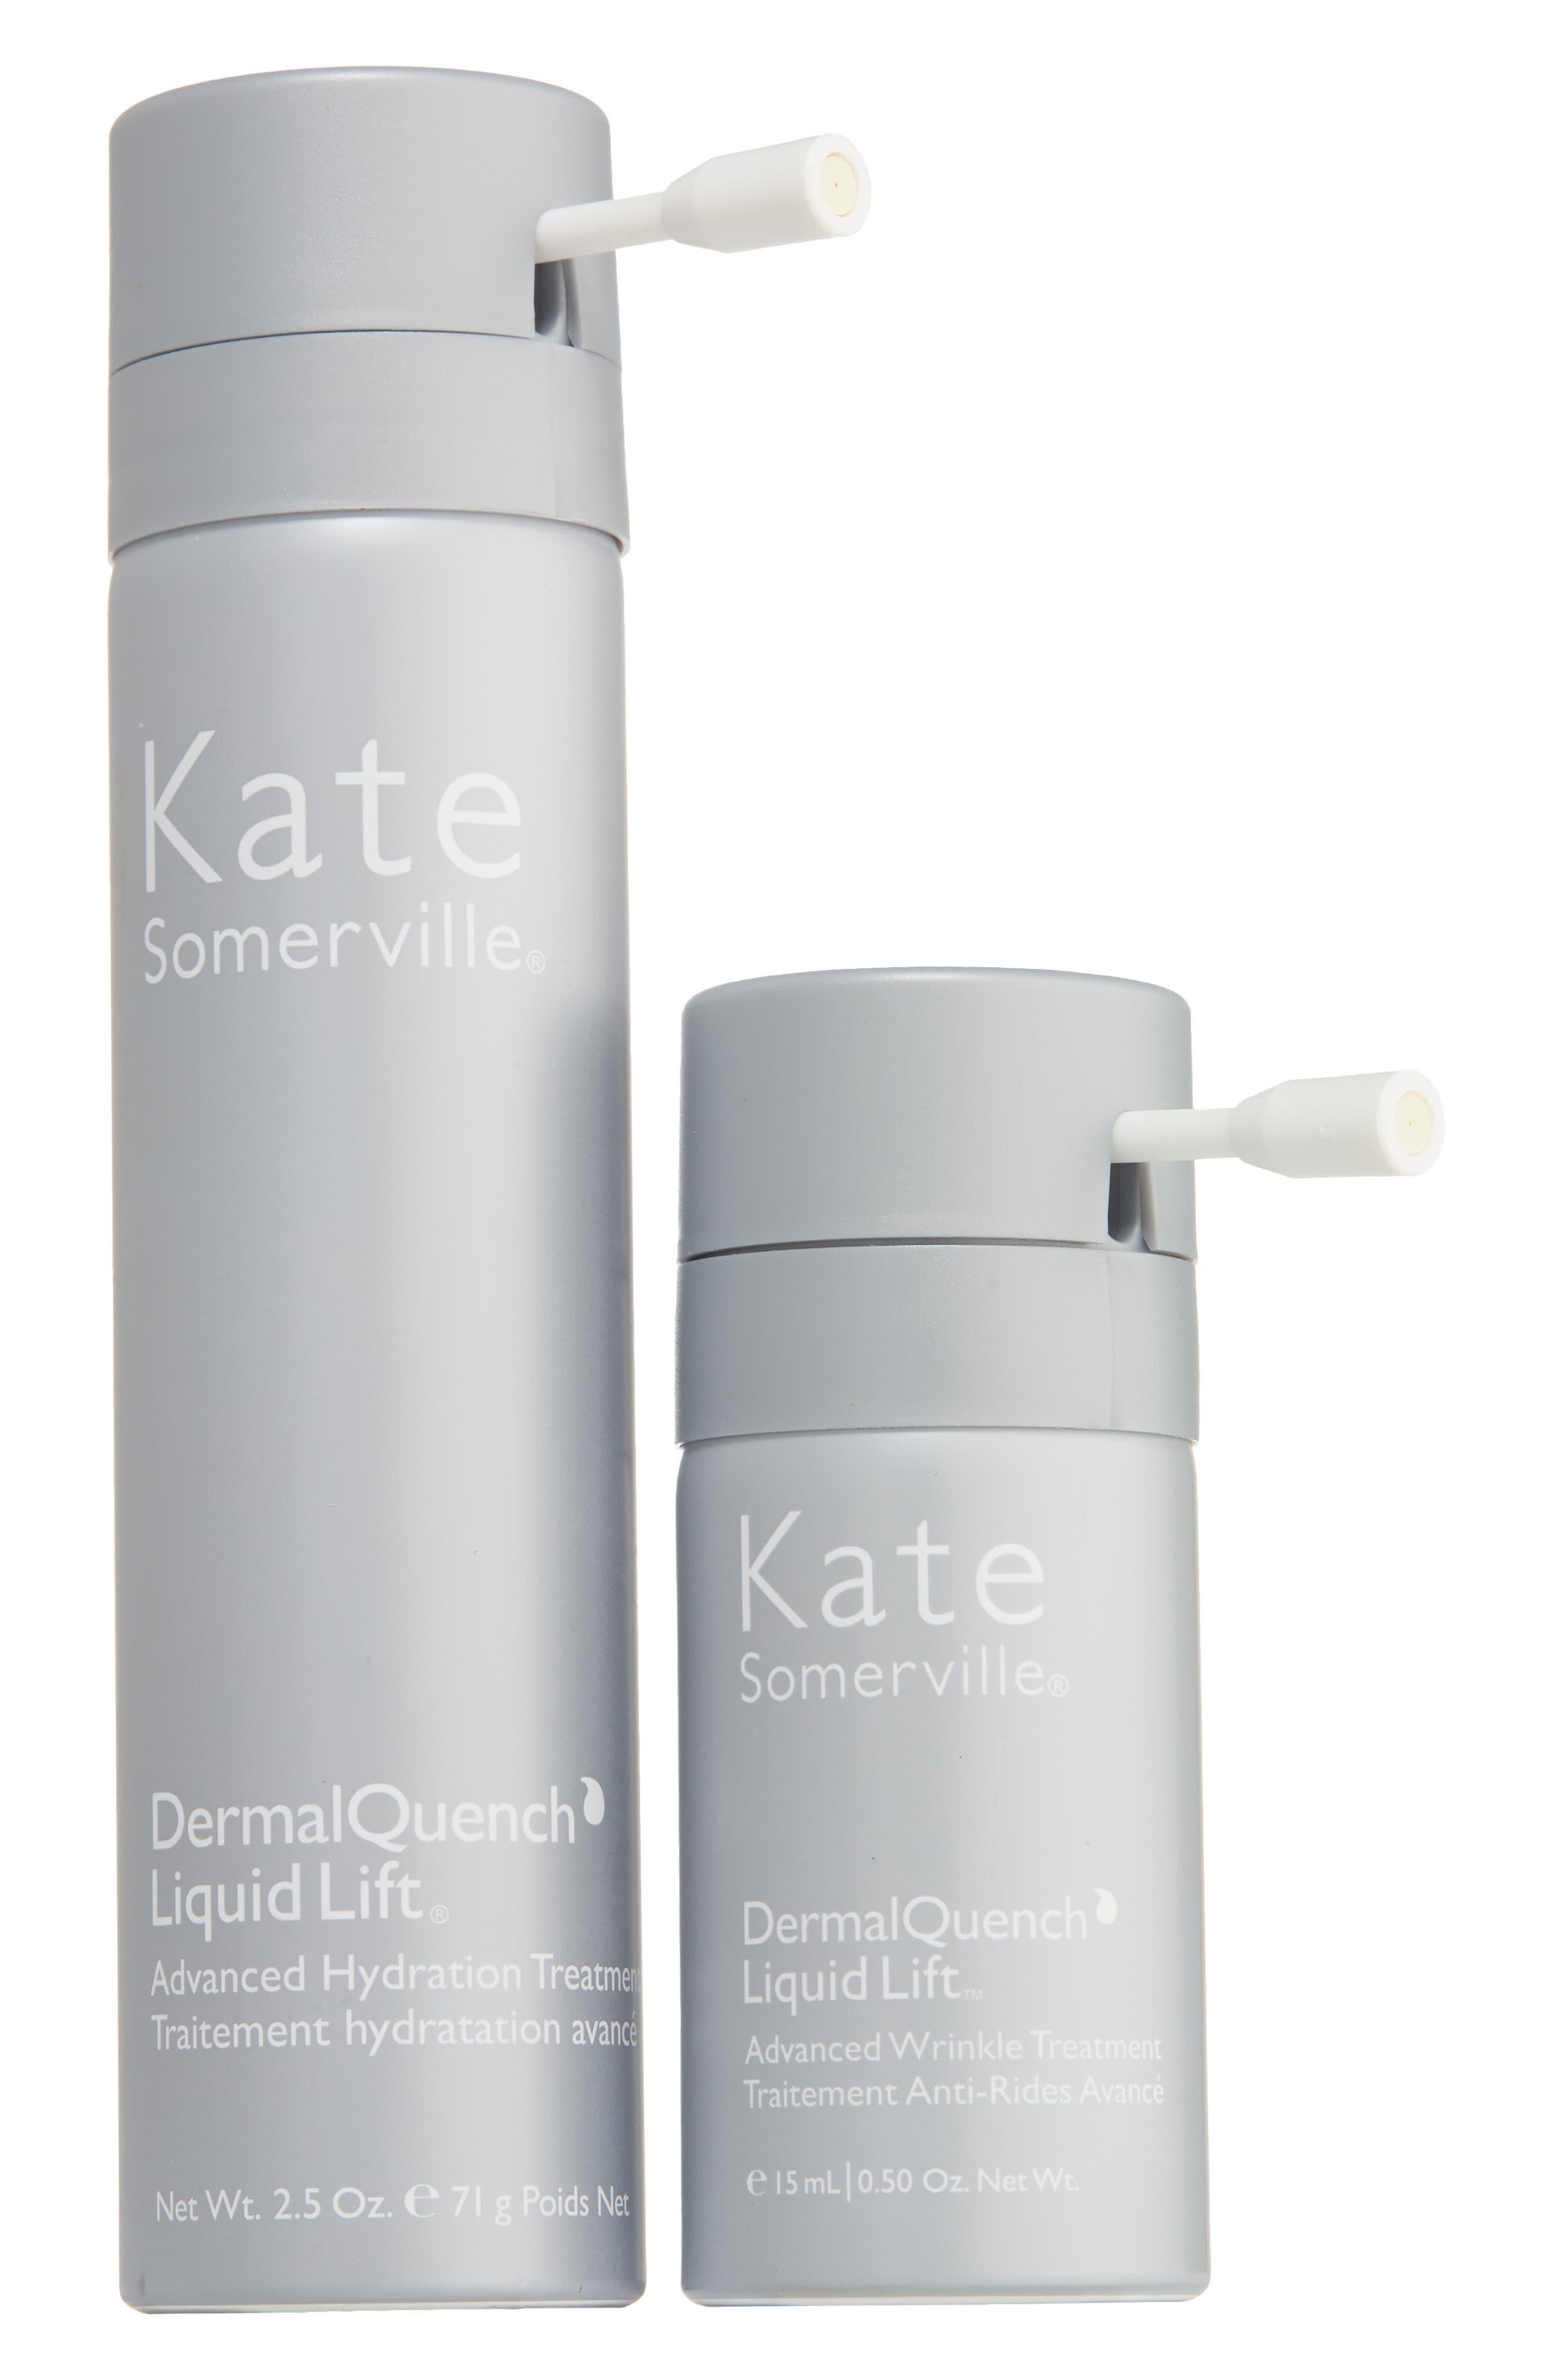 Kate Somerville Dermalquench Liquid Lift Advanced Hydration Treatment-$126 Value